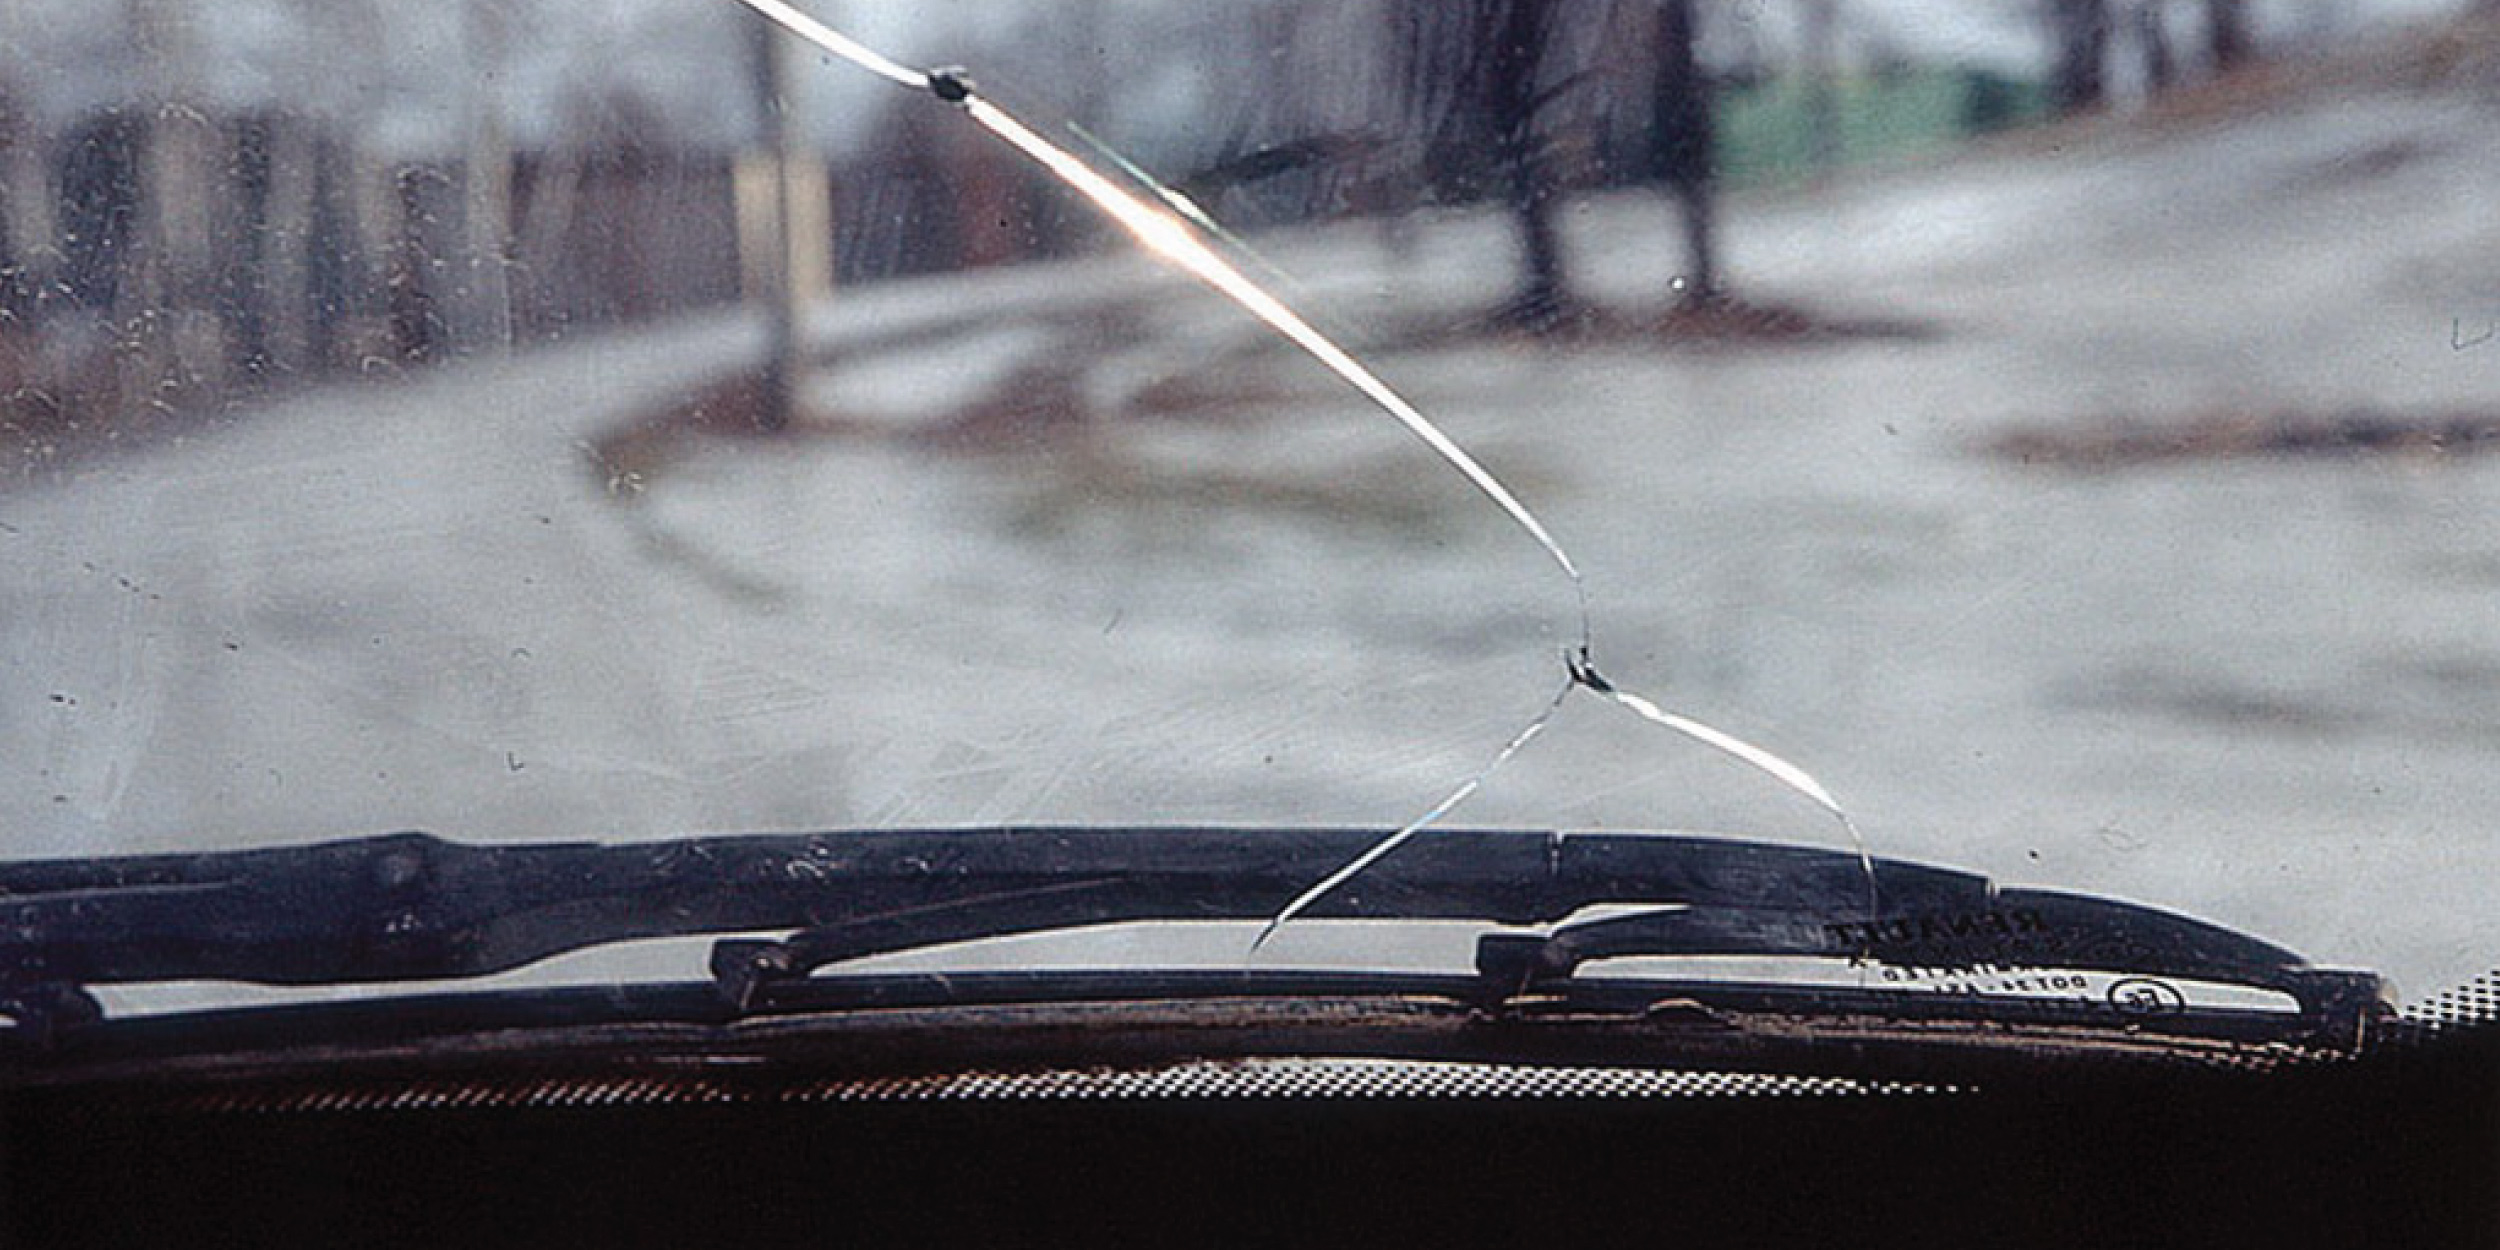 Трещина на ветровом стекле